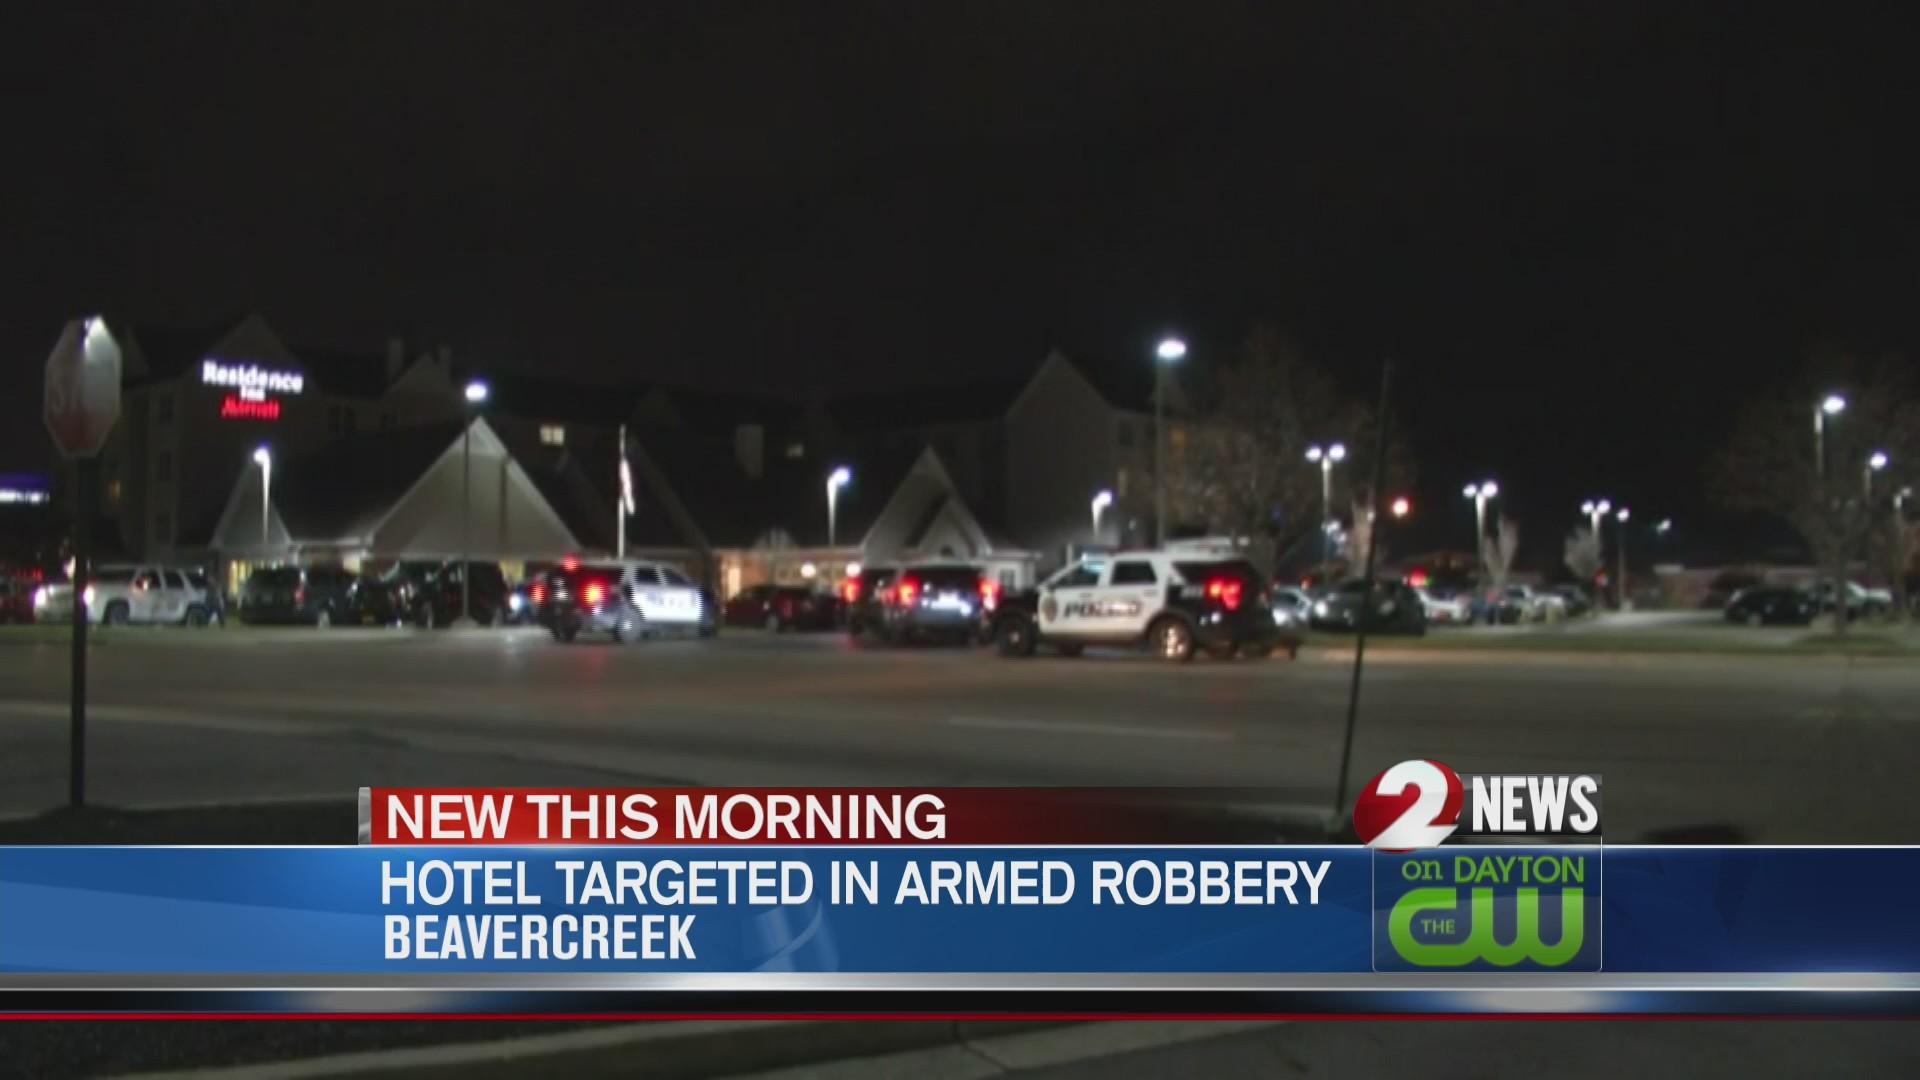 Man robs Beavercreek hotel at gunpoint